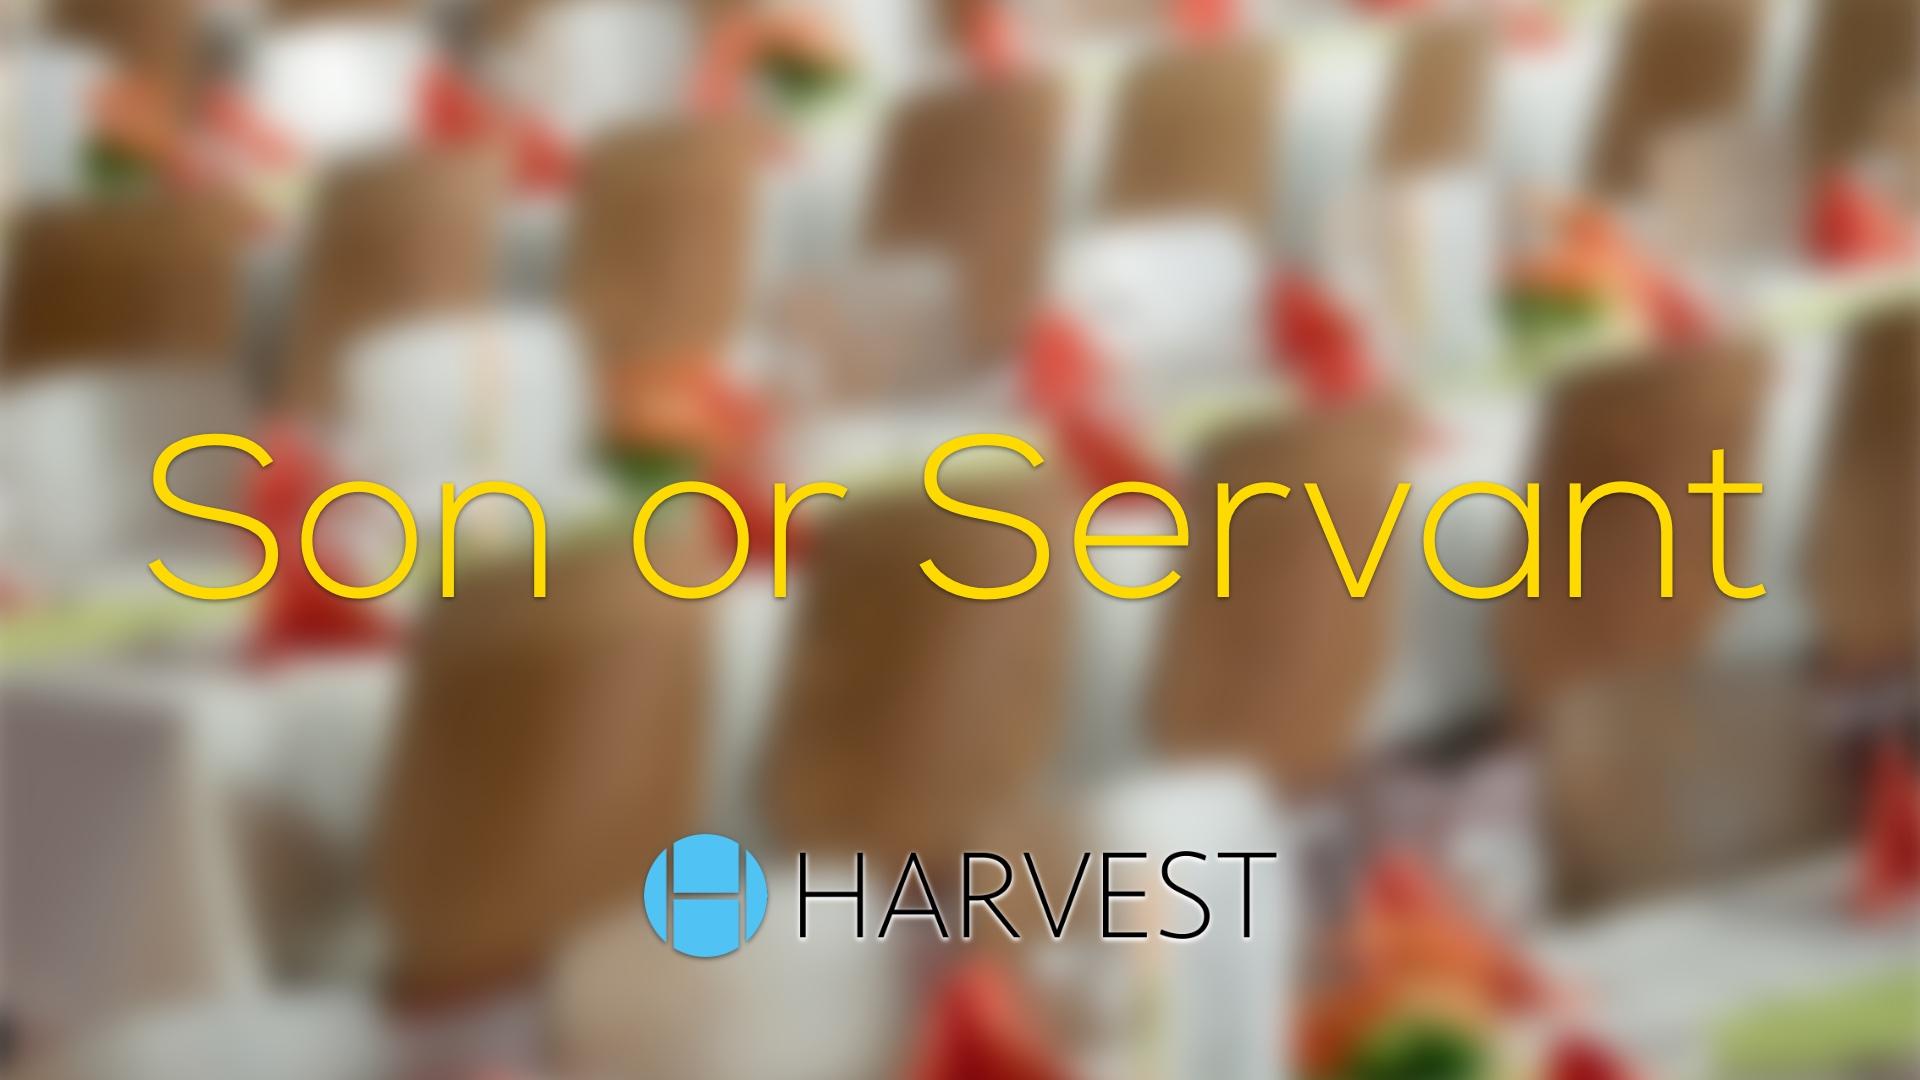 Son or Servant